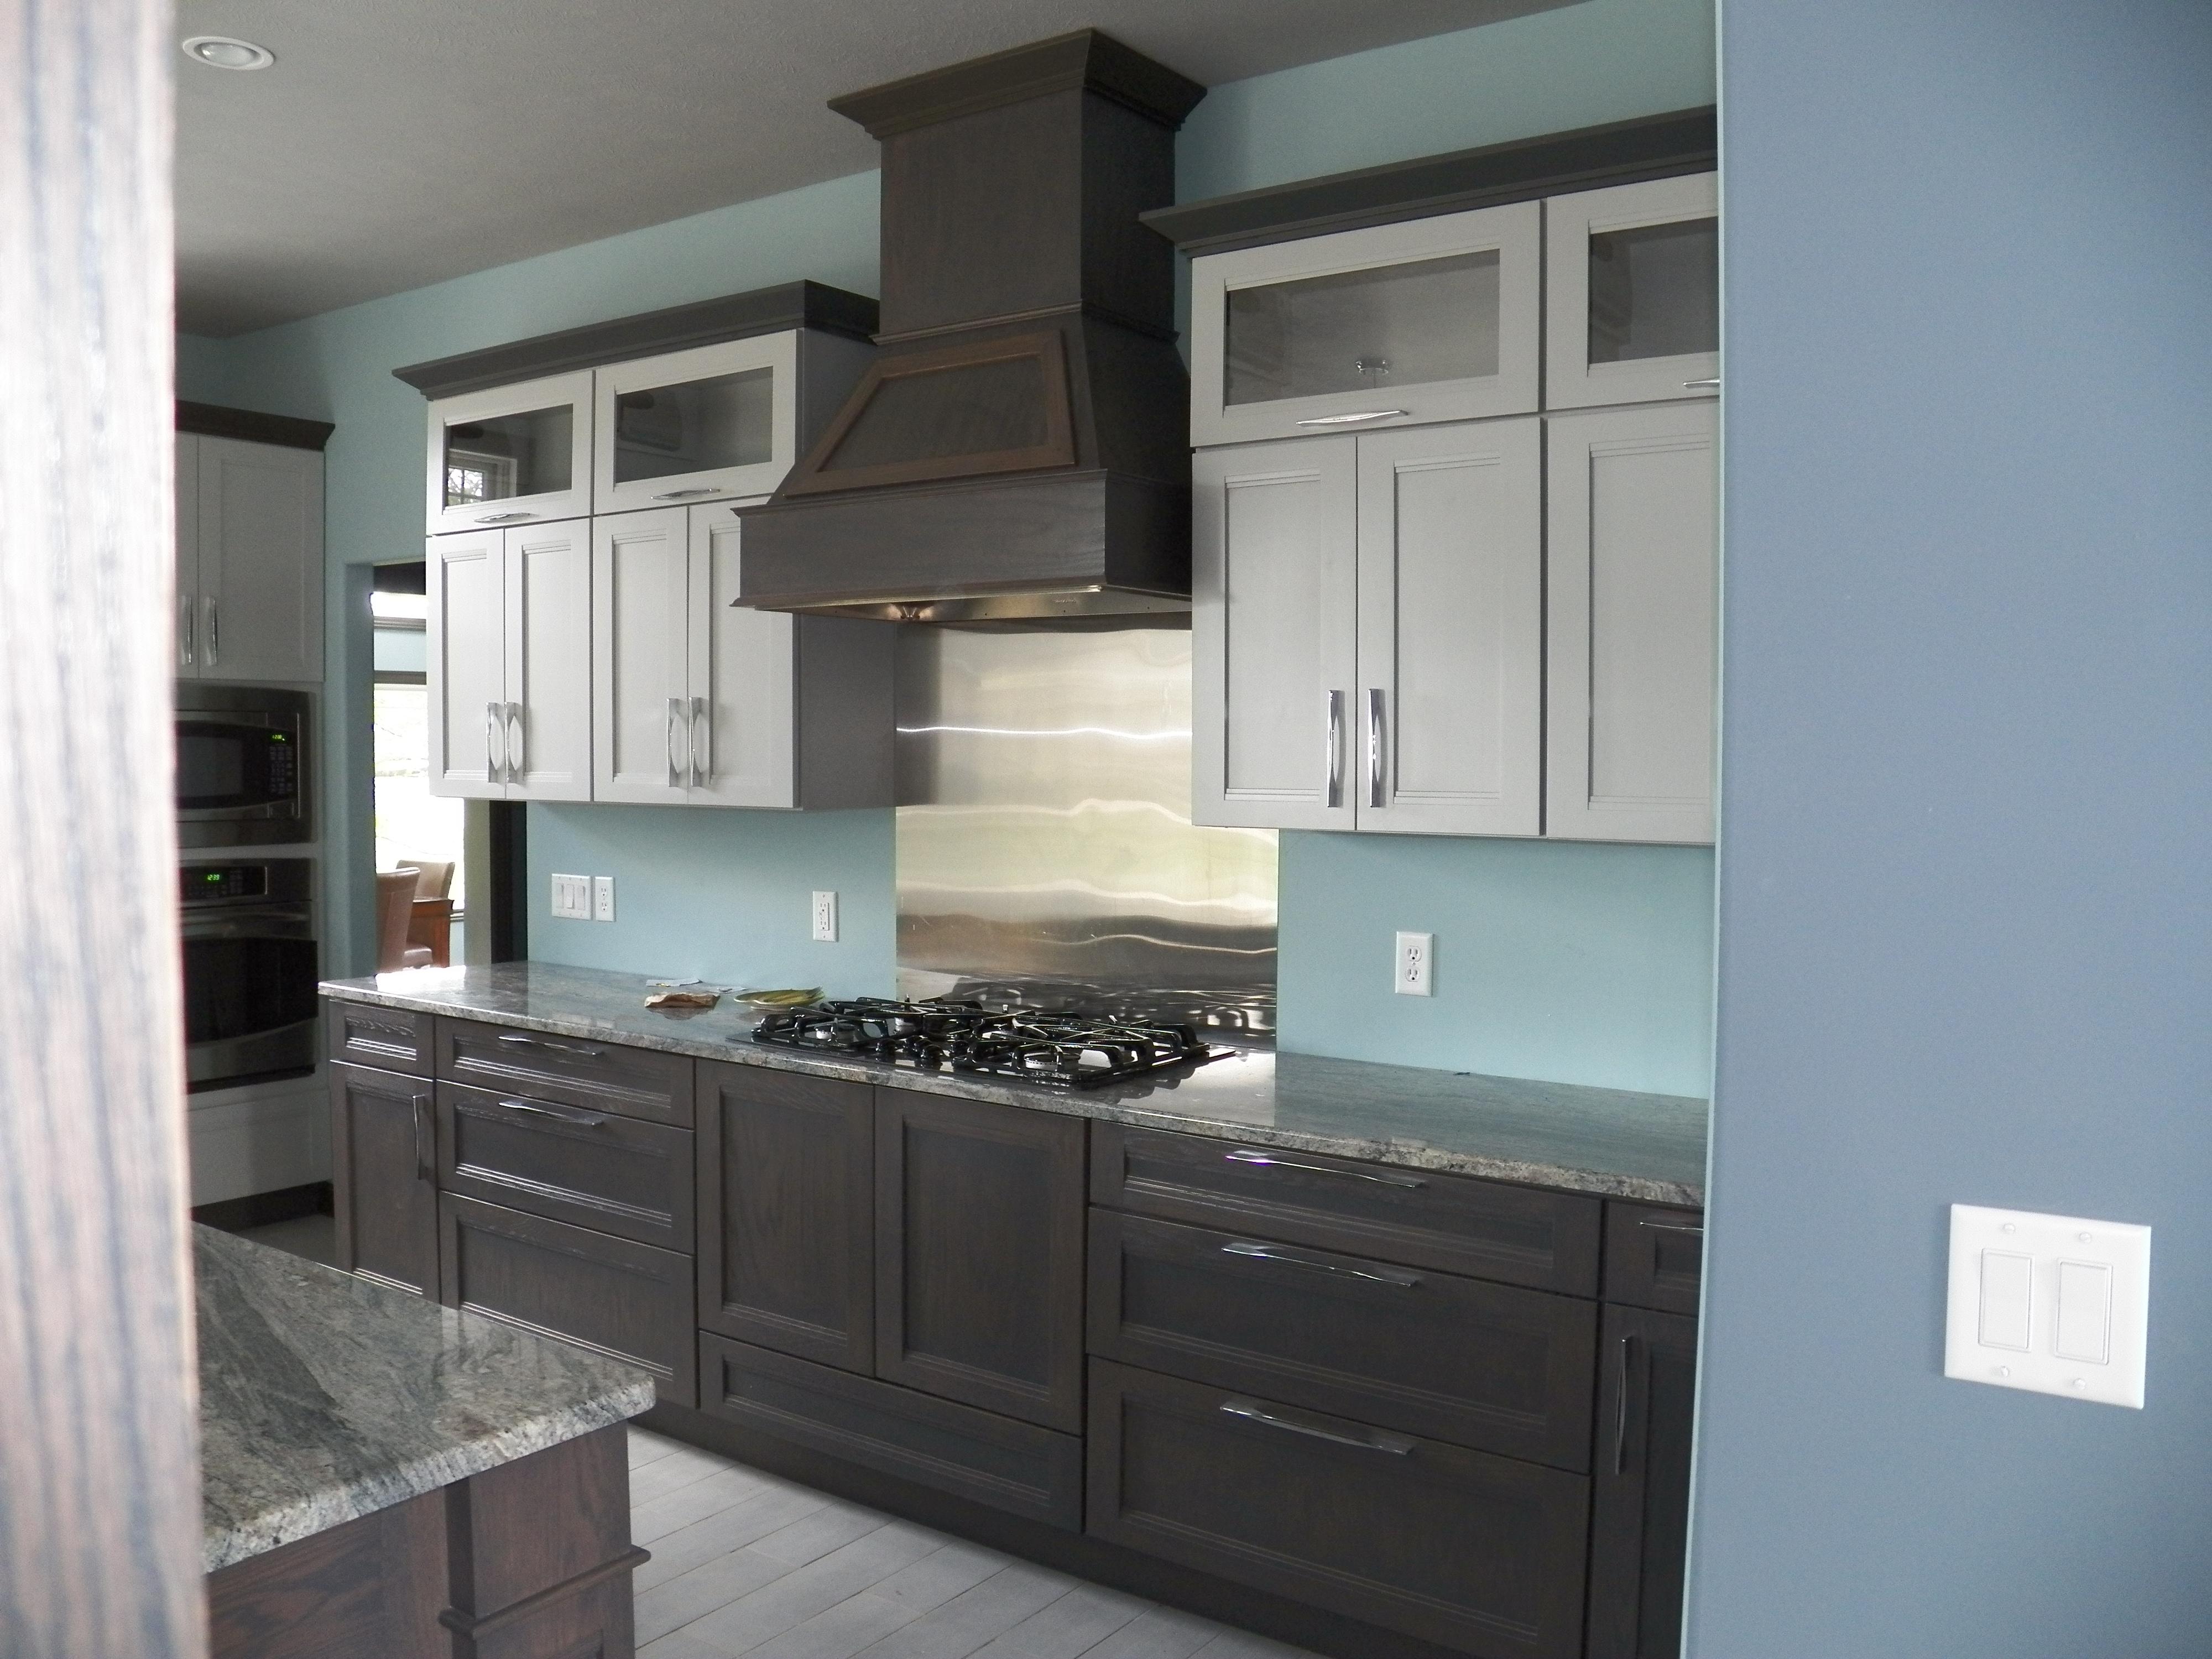 Custom Cabinets Gray Tones